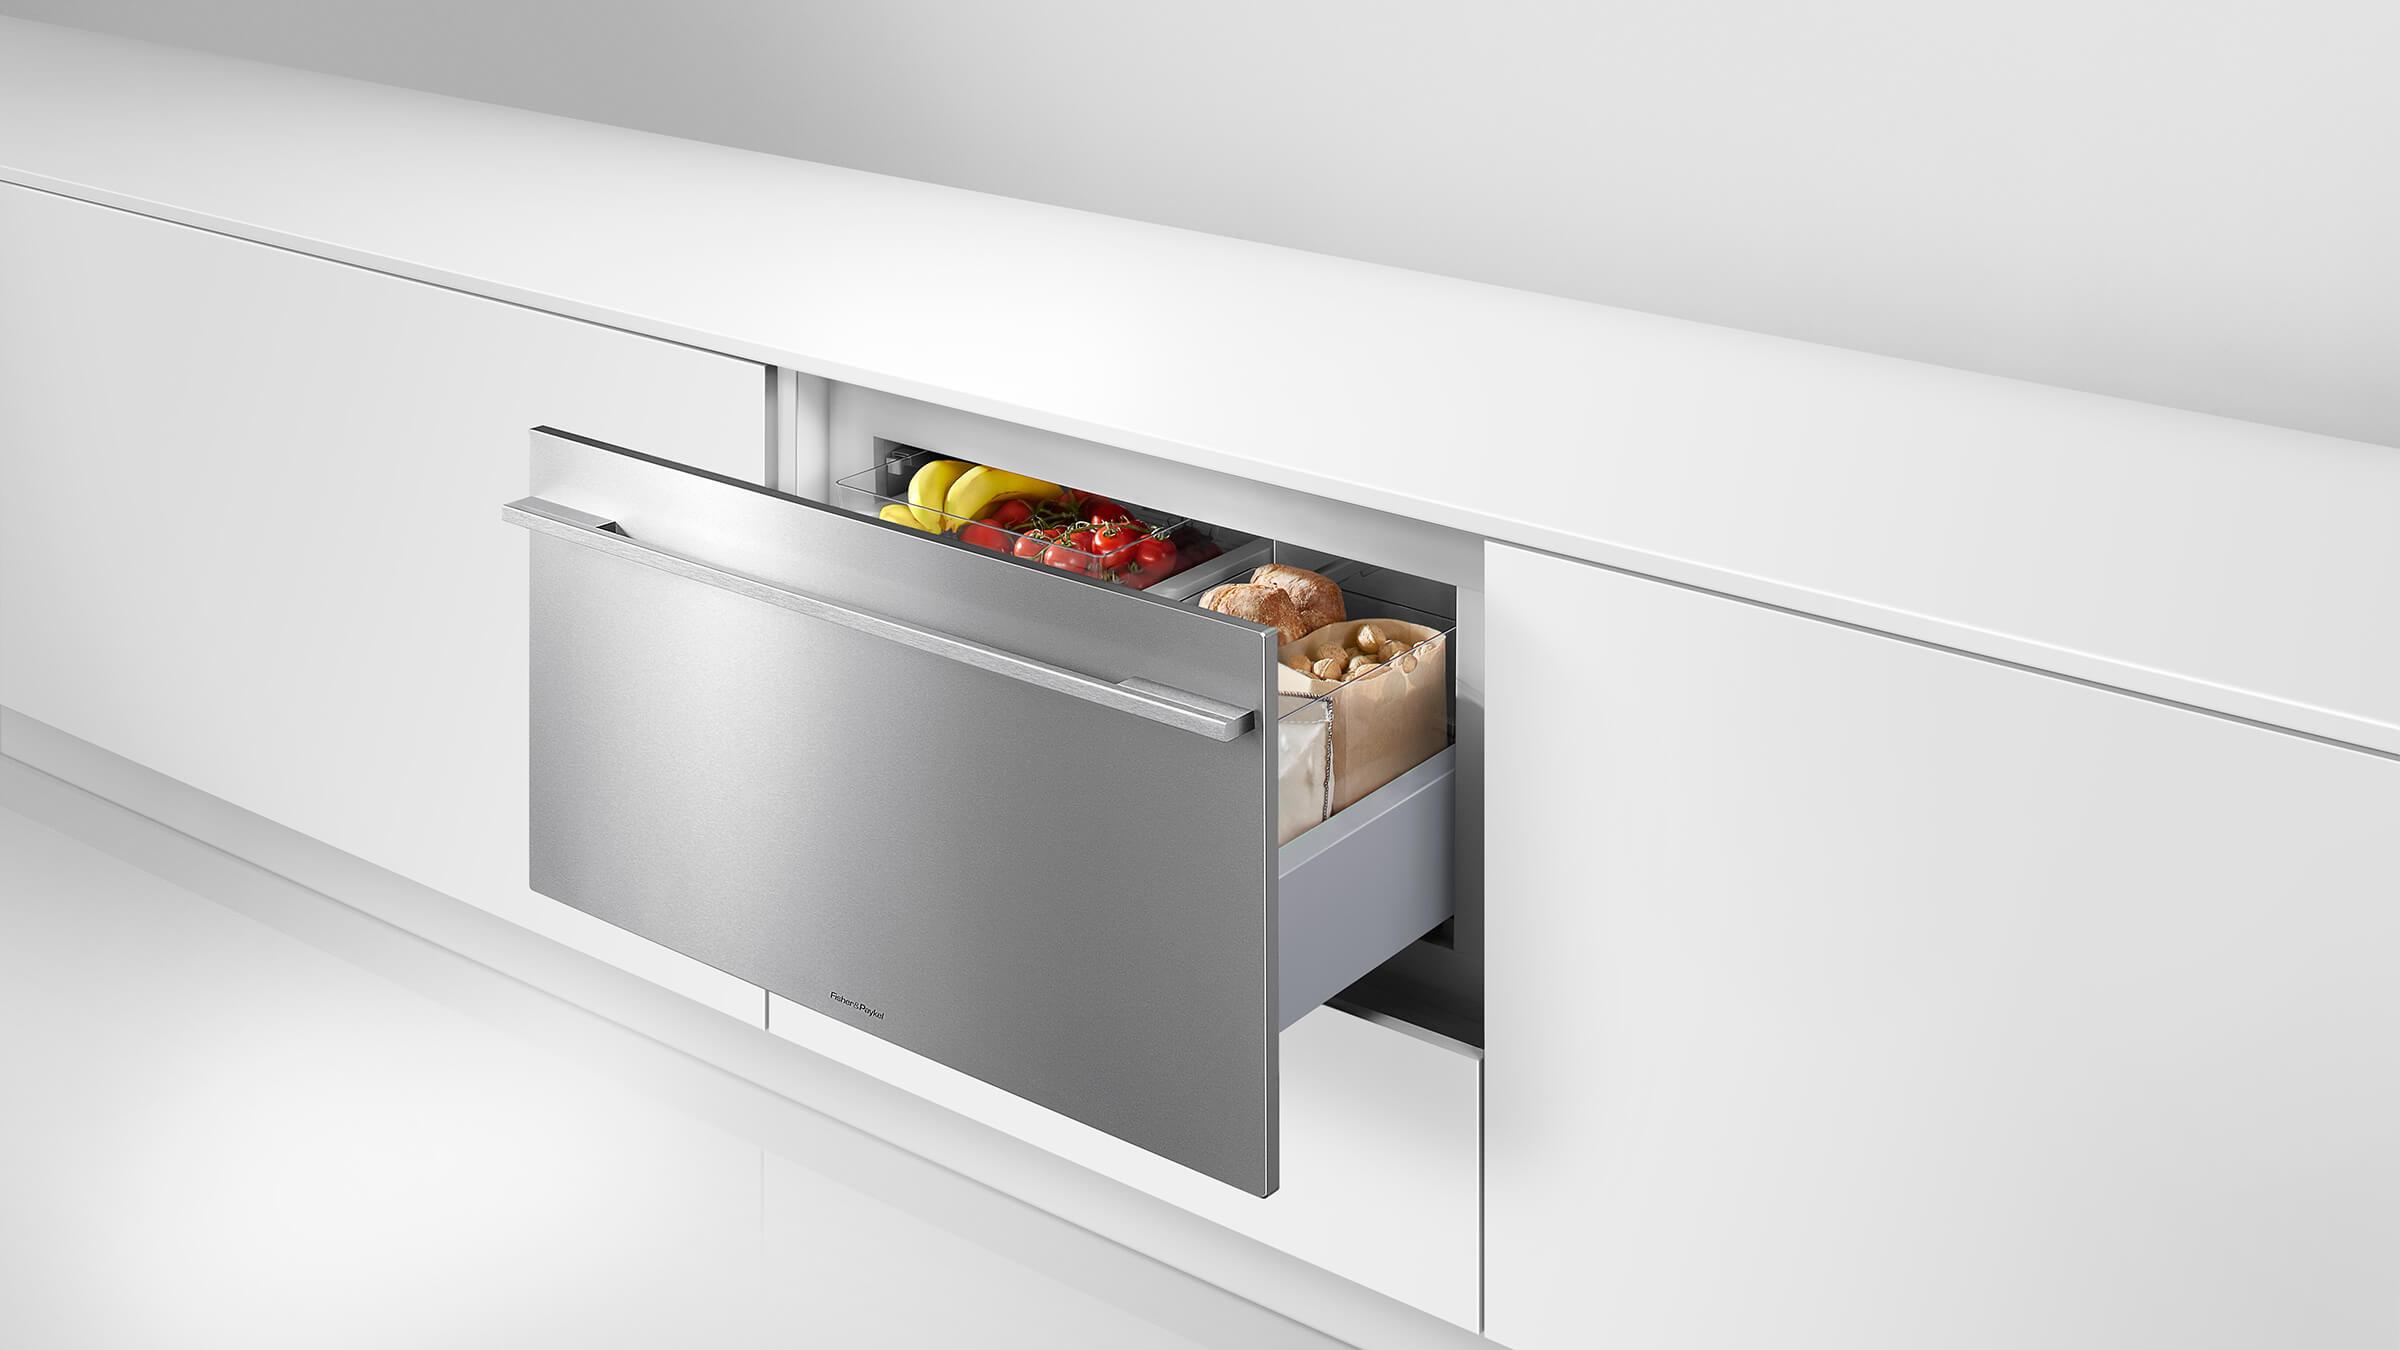 Innovative Kitchen Appliances Premium Kitchen Appliances